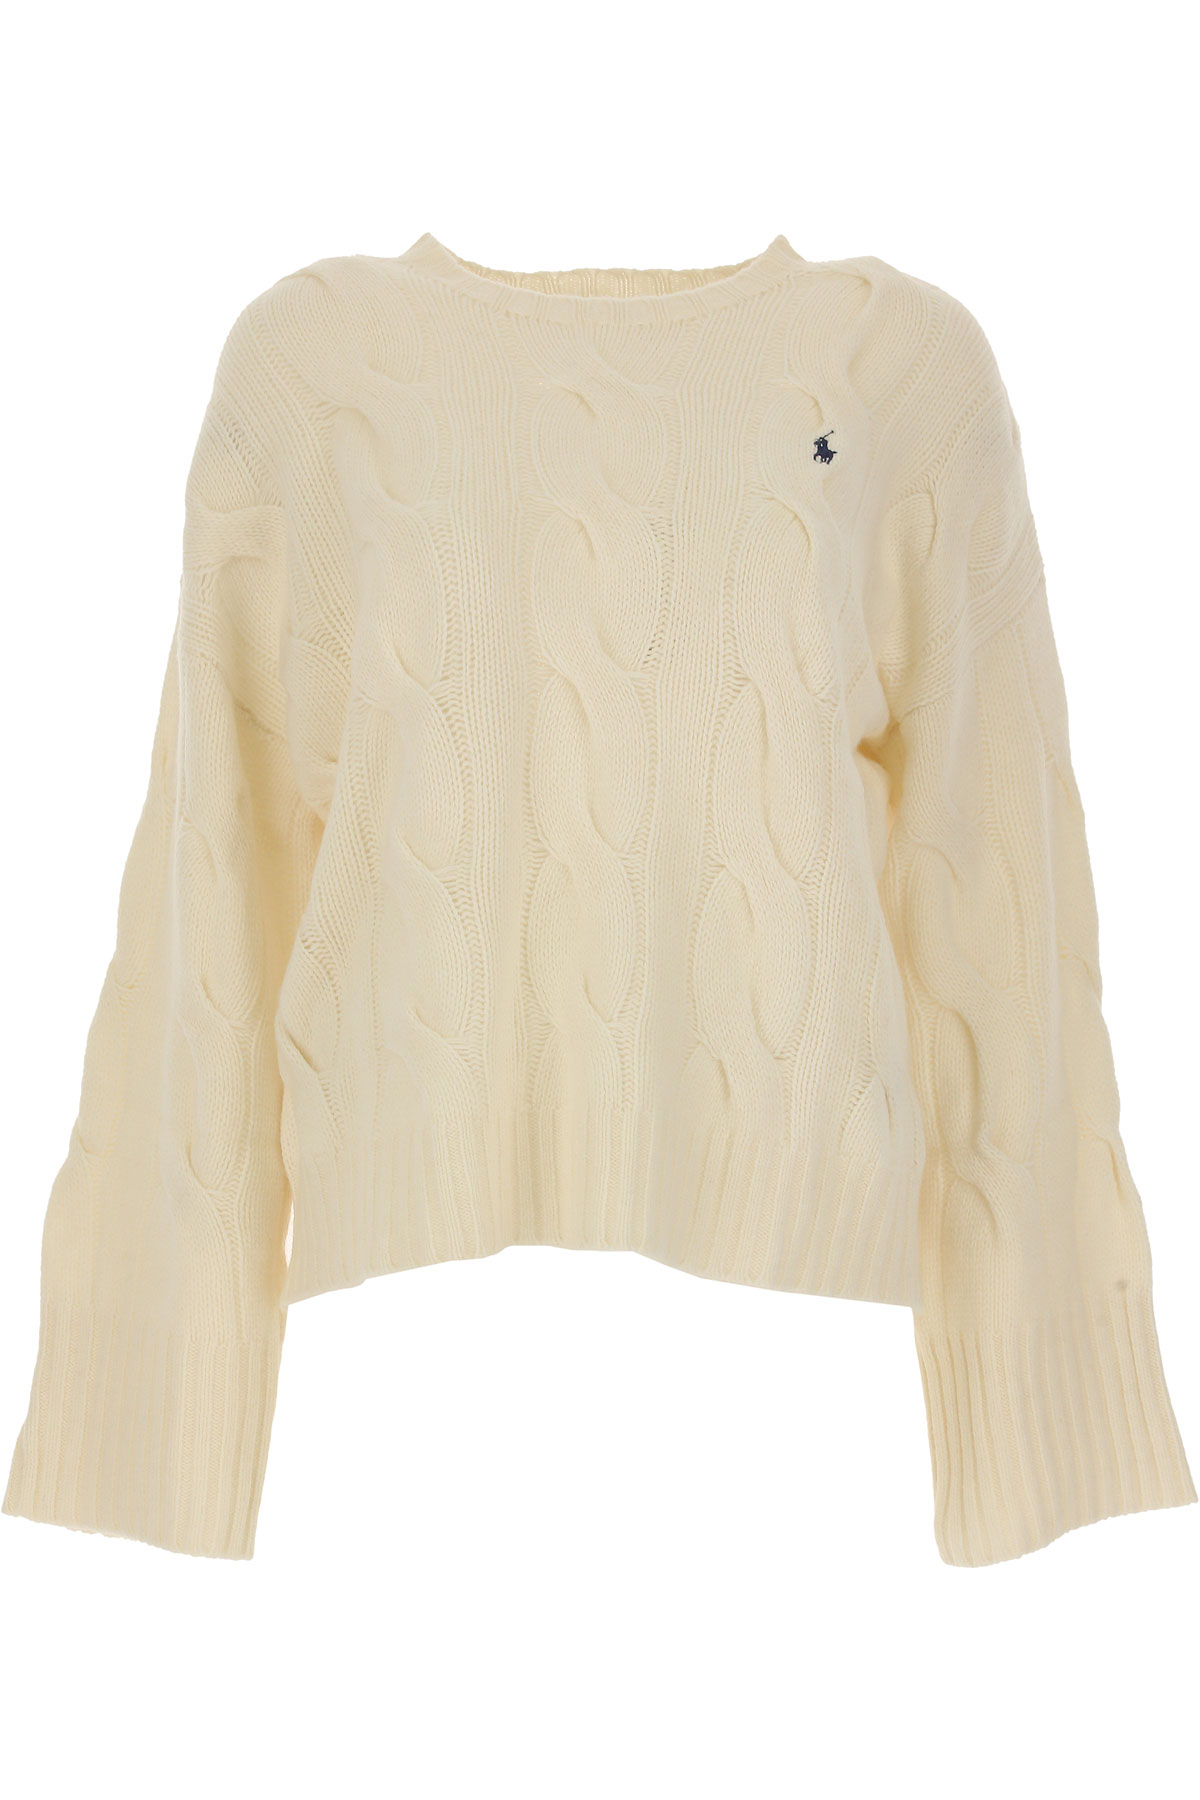 Ralph Lauren Sweater for Women Jumper On Sale, Cream, merino wool, 2017, 4 6